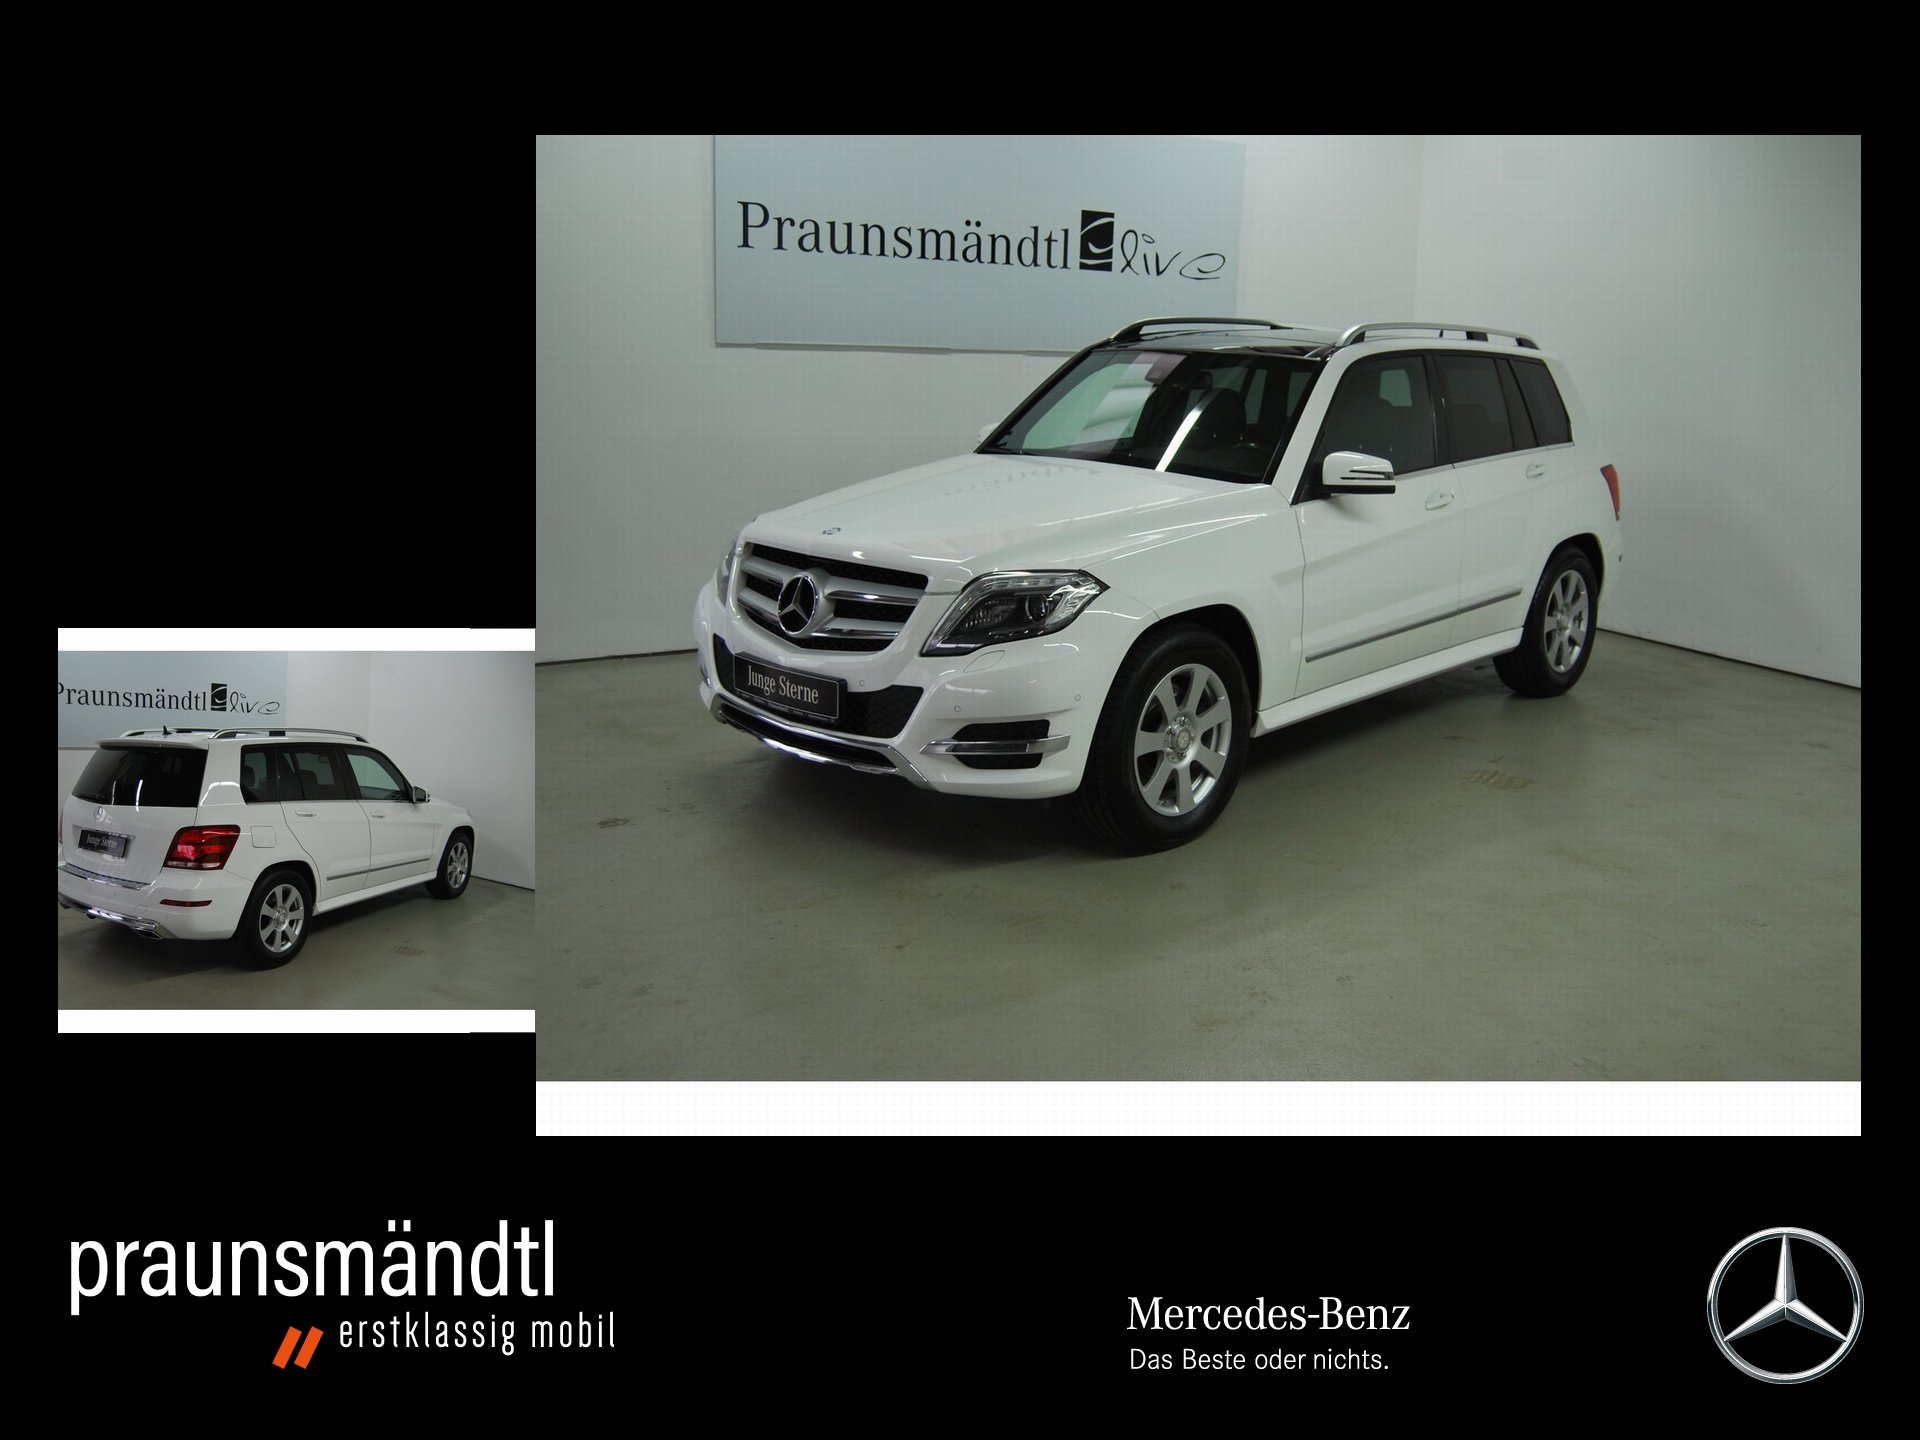 Mercedes-Benz GLK 220 CDI 4M 7AG/Coman/AHK/Pano/Kamera/ILS/PTS, Jahr 2015, Diesel